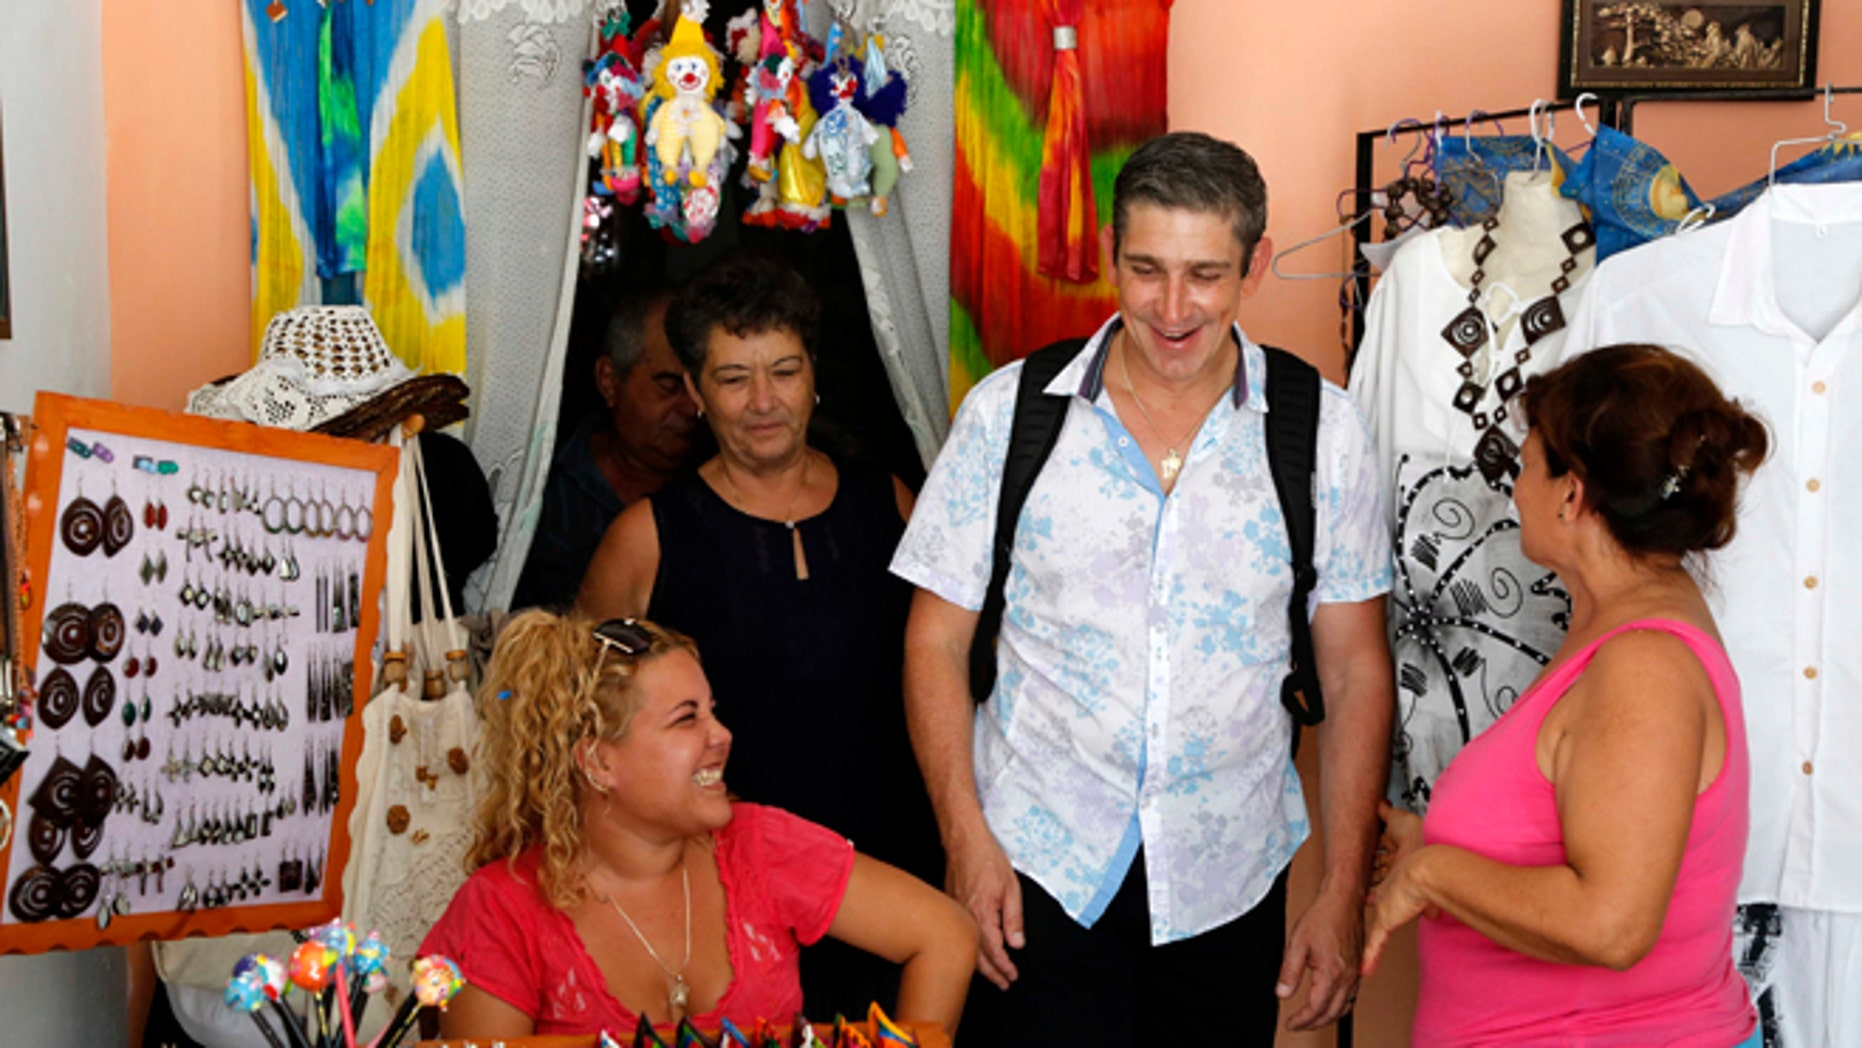 Poet Richard Blanco, accompanied by family members, visits Cienfuegos, Cuba, on June 17, 2015 .